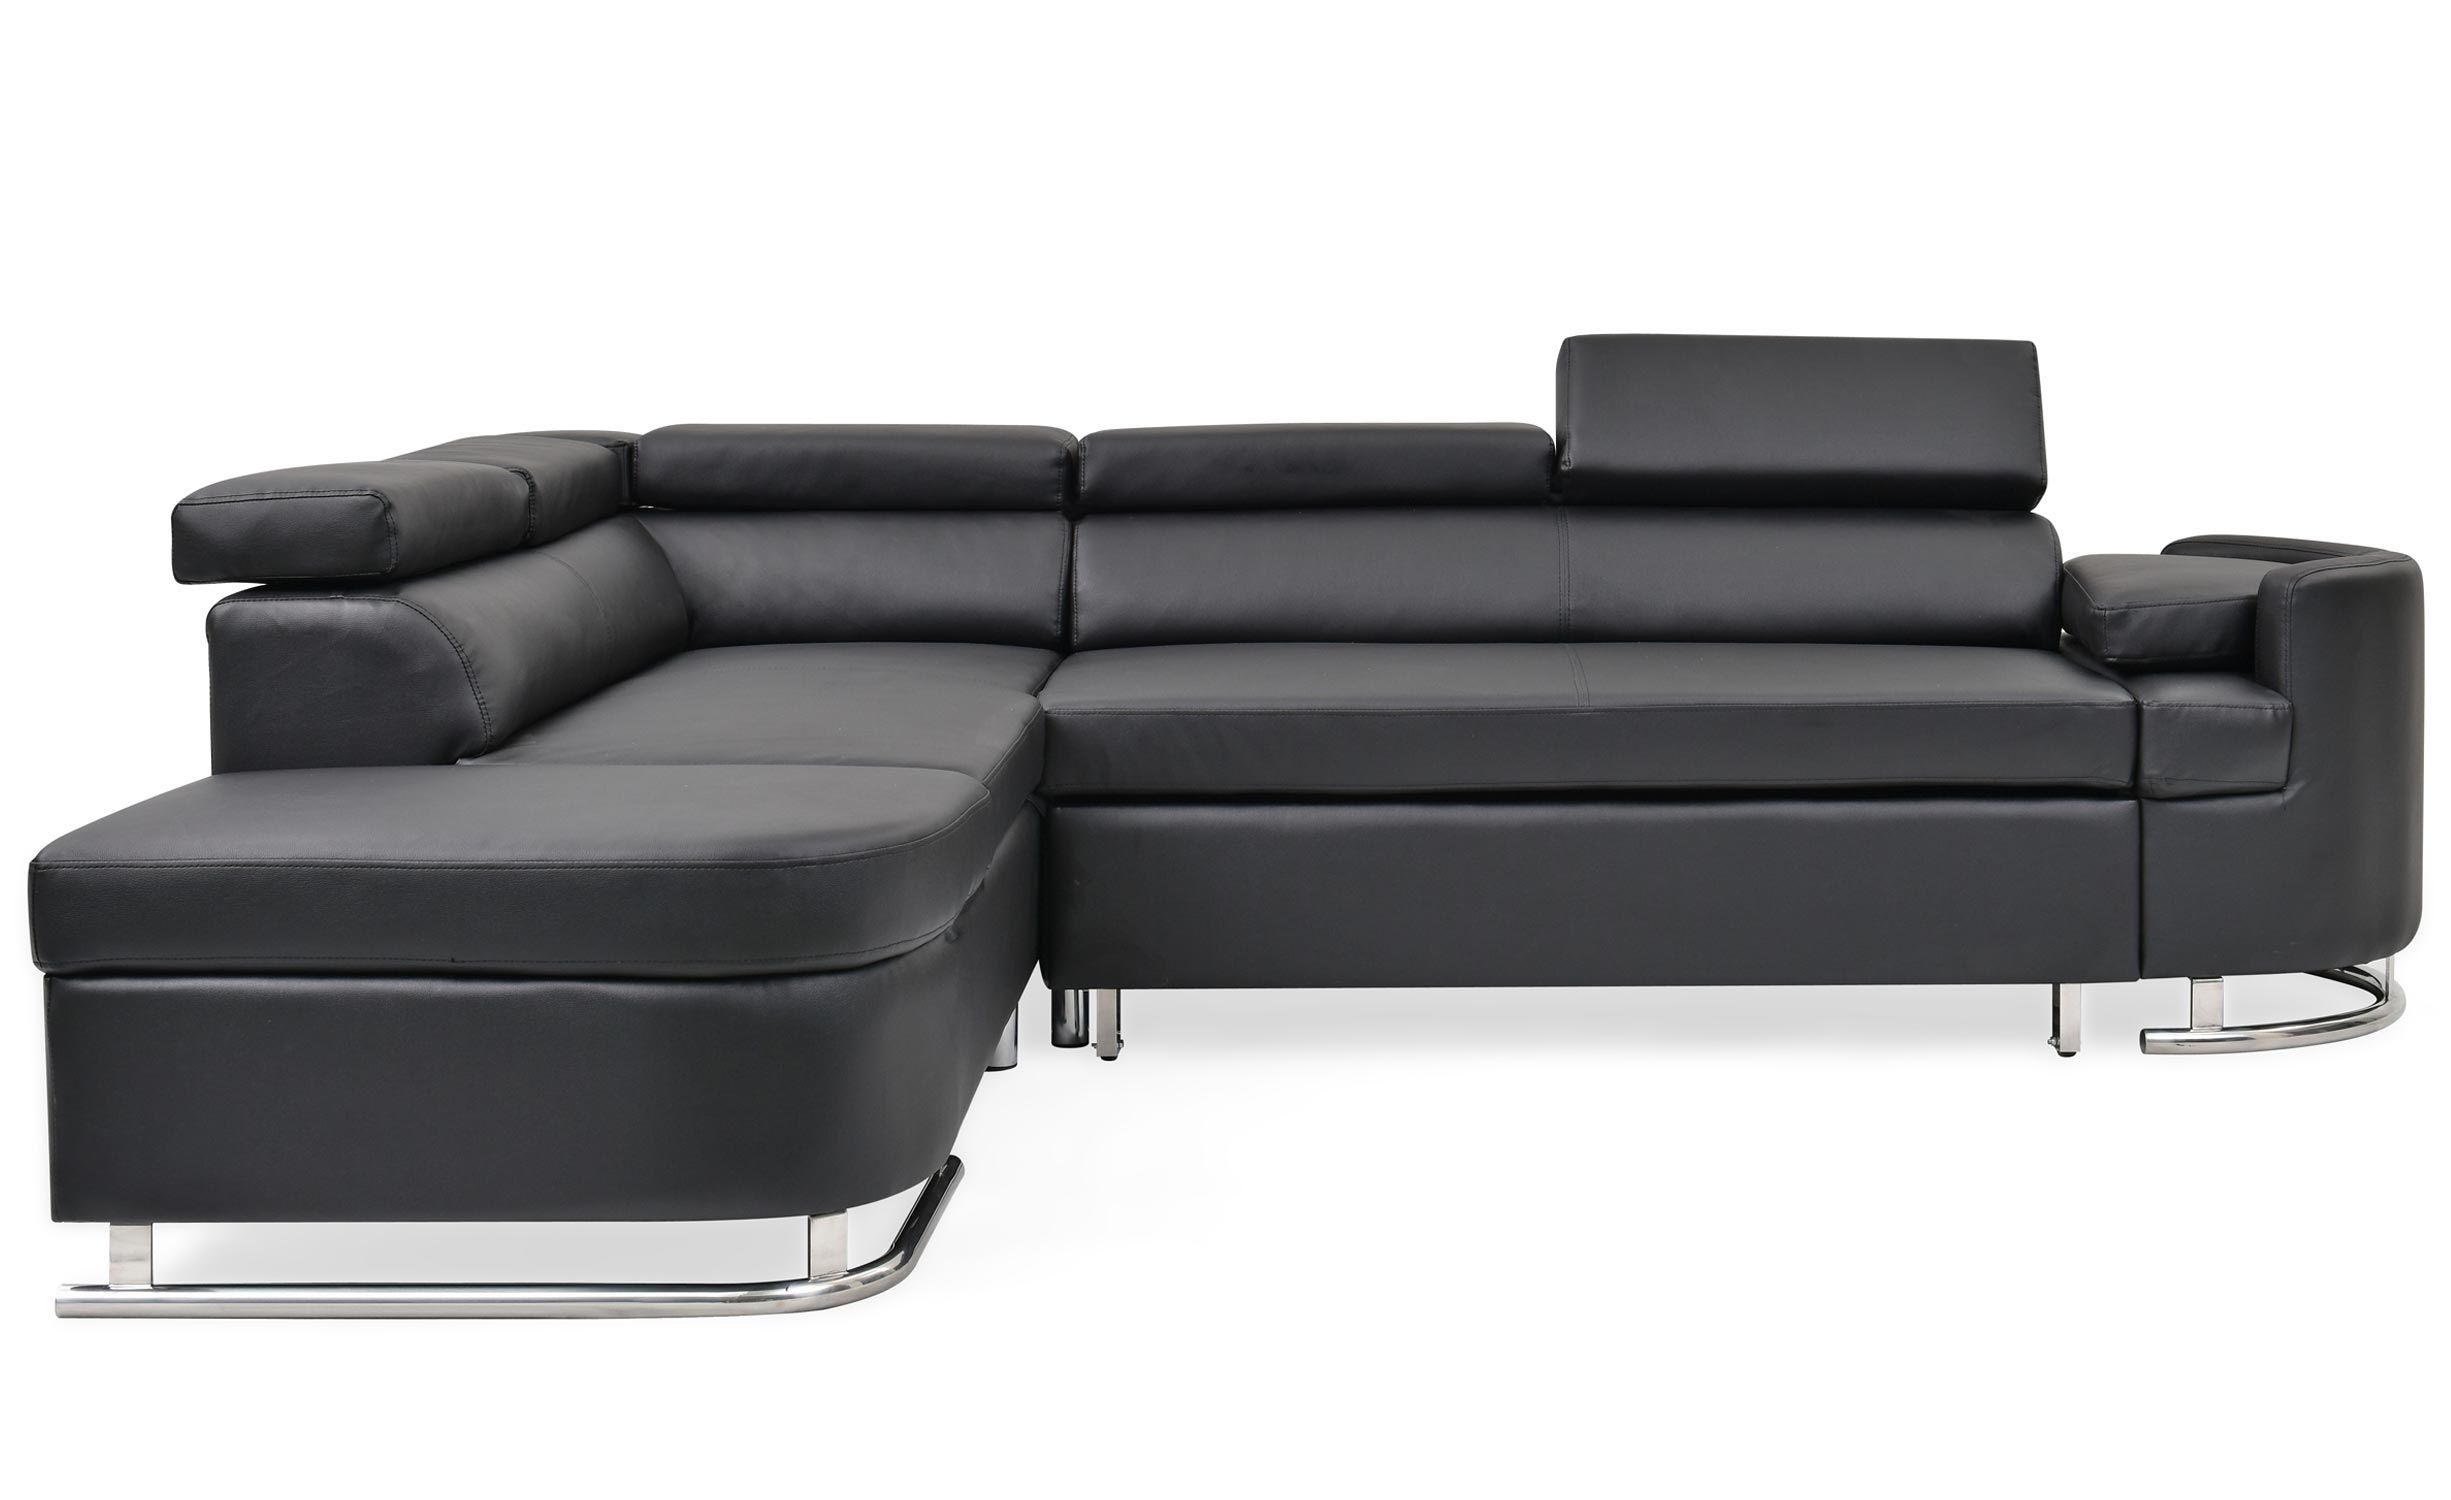 Canape D Angle Convertible Branca Simili Noir En 2020 Canape Angle Canape Angle Convertible Et Canape Arrondi